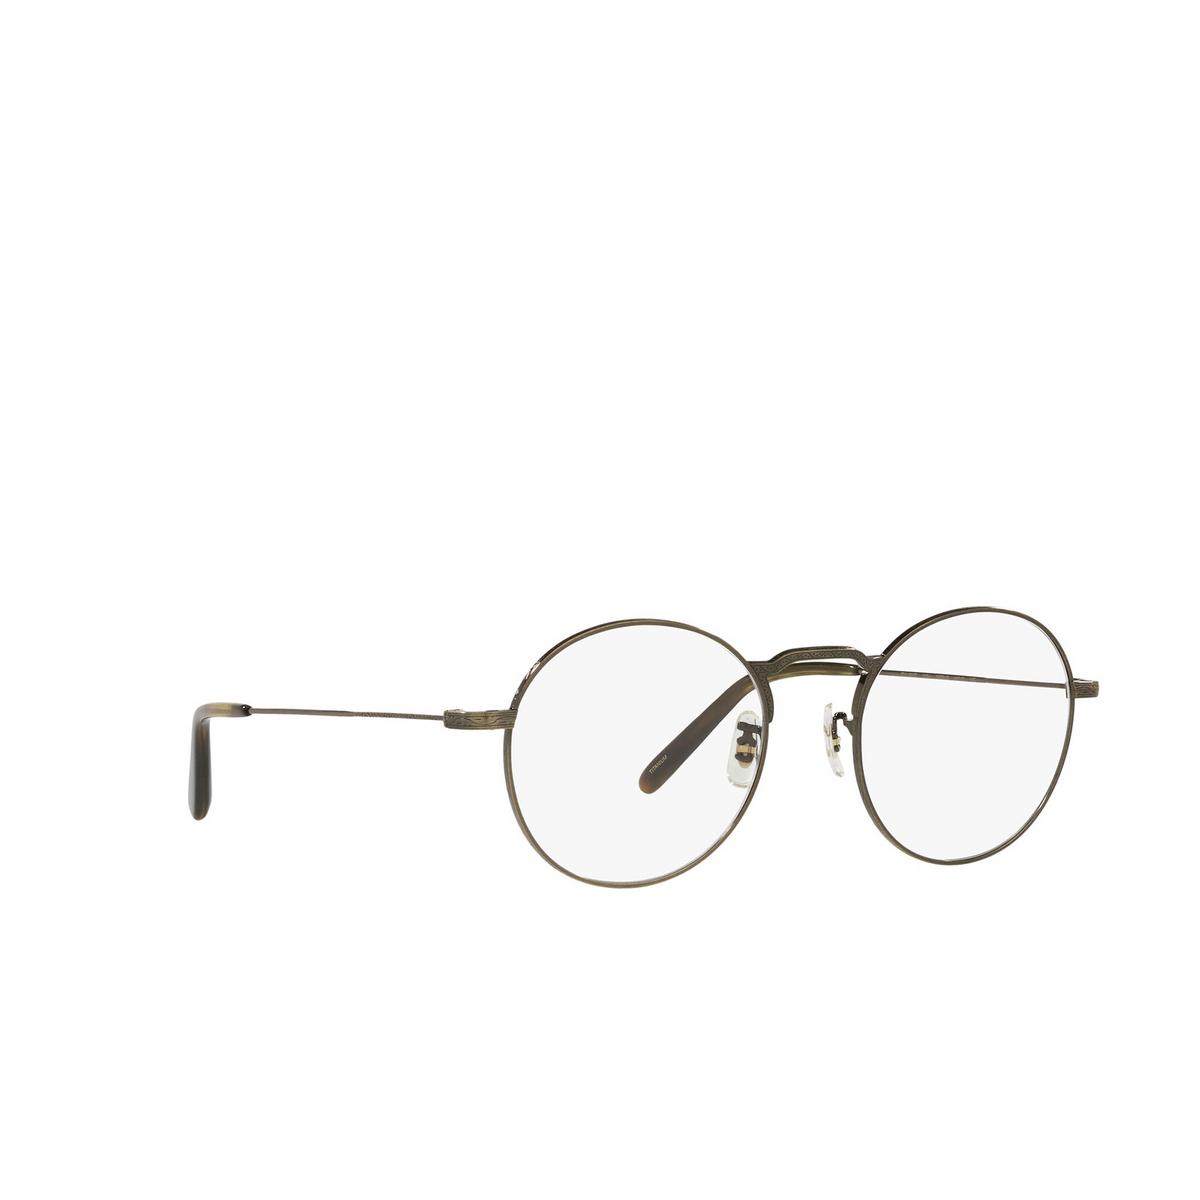 Oliver Peoples® Round Eyeglasses: Weslie OV1282T color Antique Gold 5284 - three-quarters view.